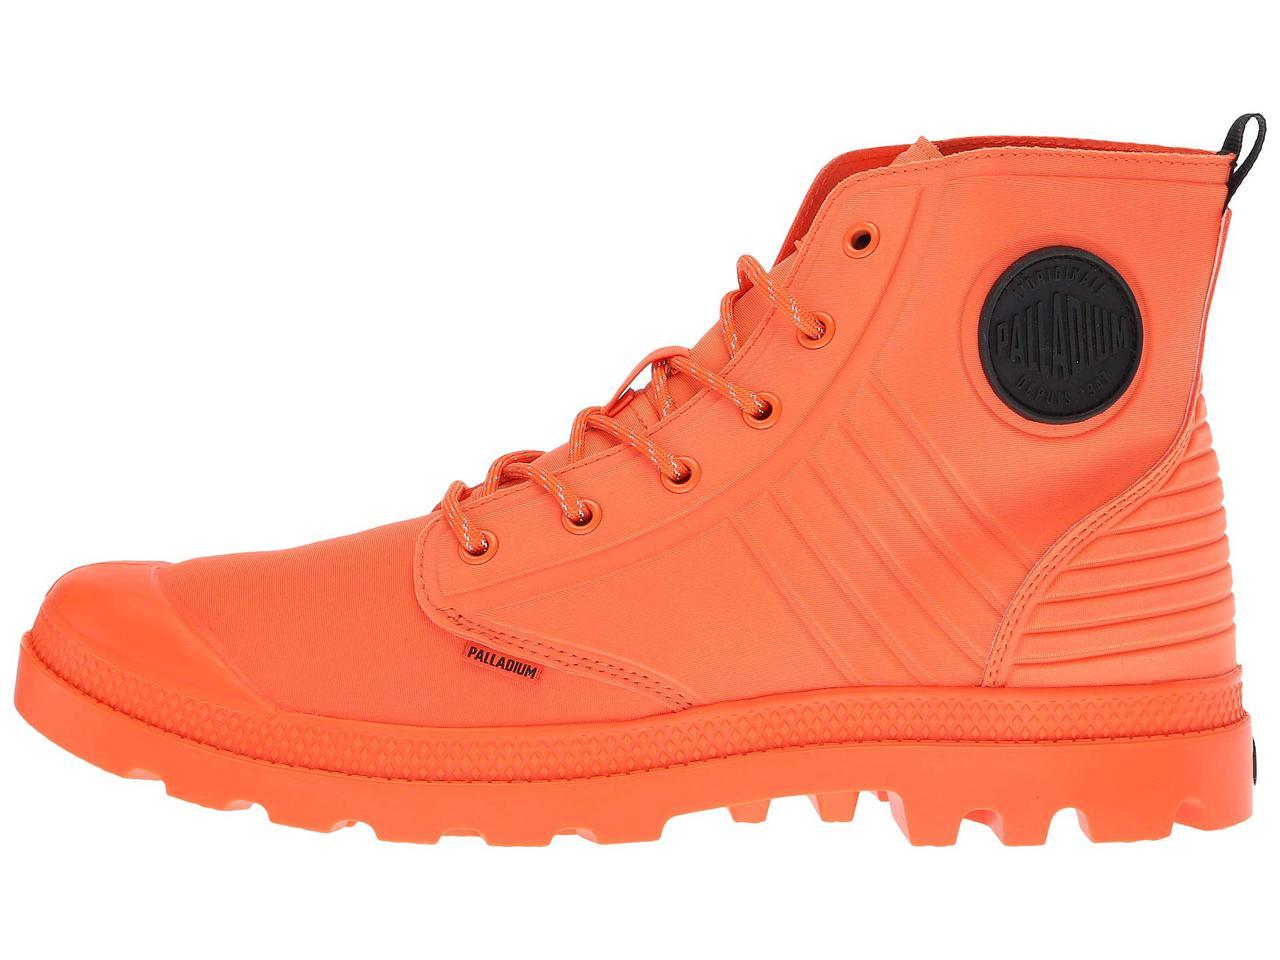 Ботинки Сапоги (Оригинал) Palladium Pampa Amphibian Firecracker Black e6b7a7395f3b8